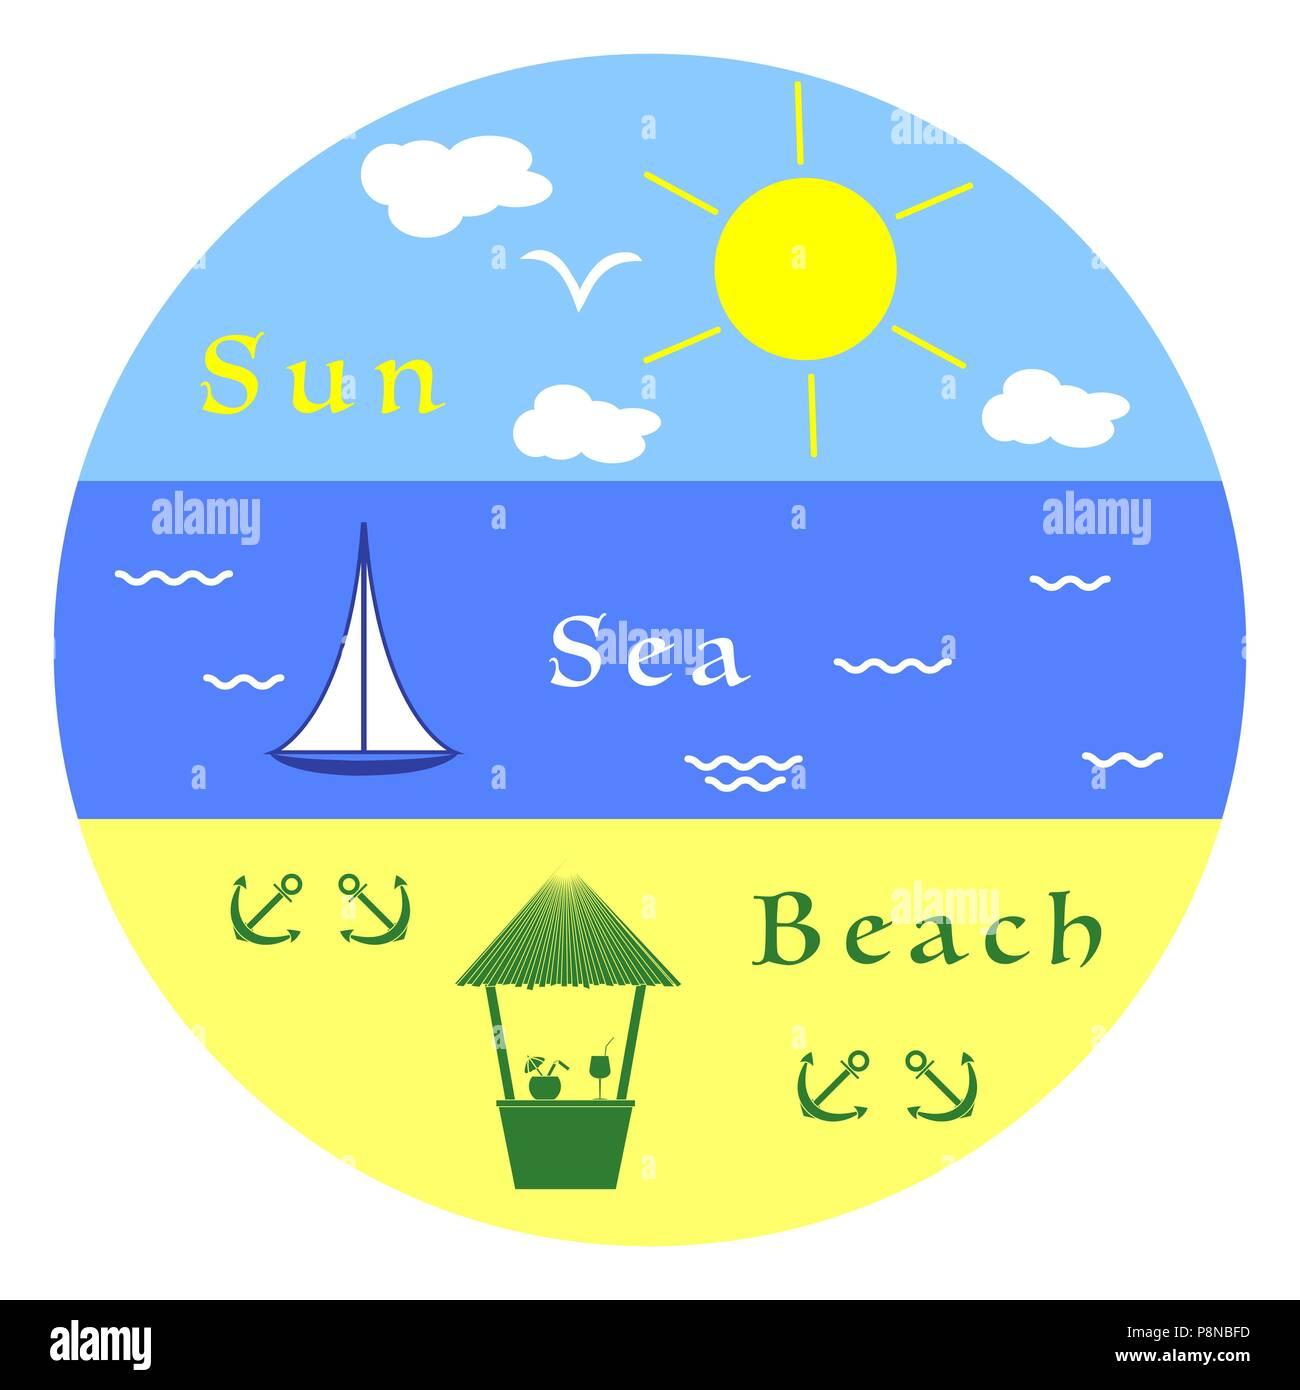 Sun, clouds, bird, sea, waves, yacht, beach, anchors, bar. Summer leisure. - Stock Image